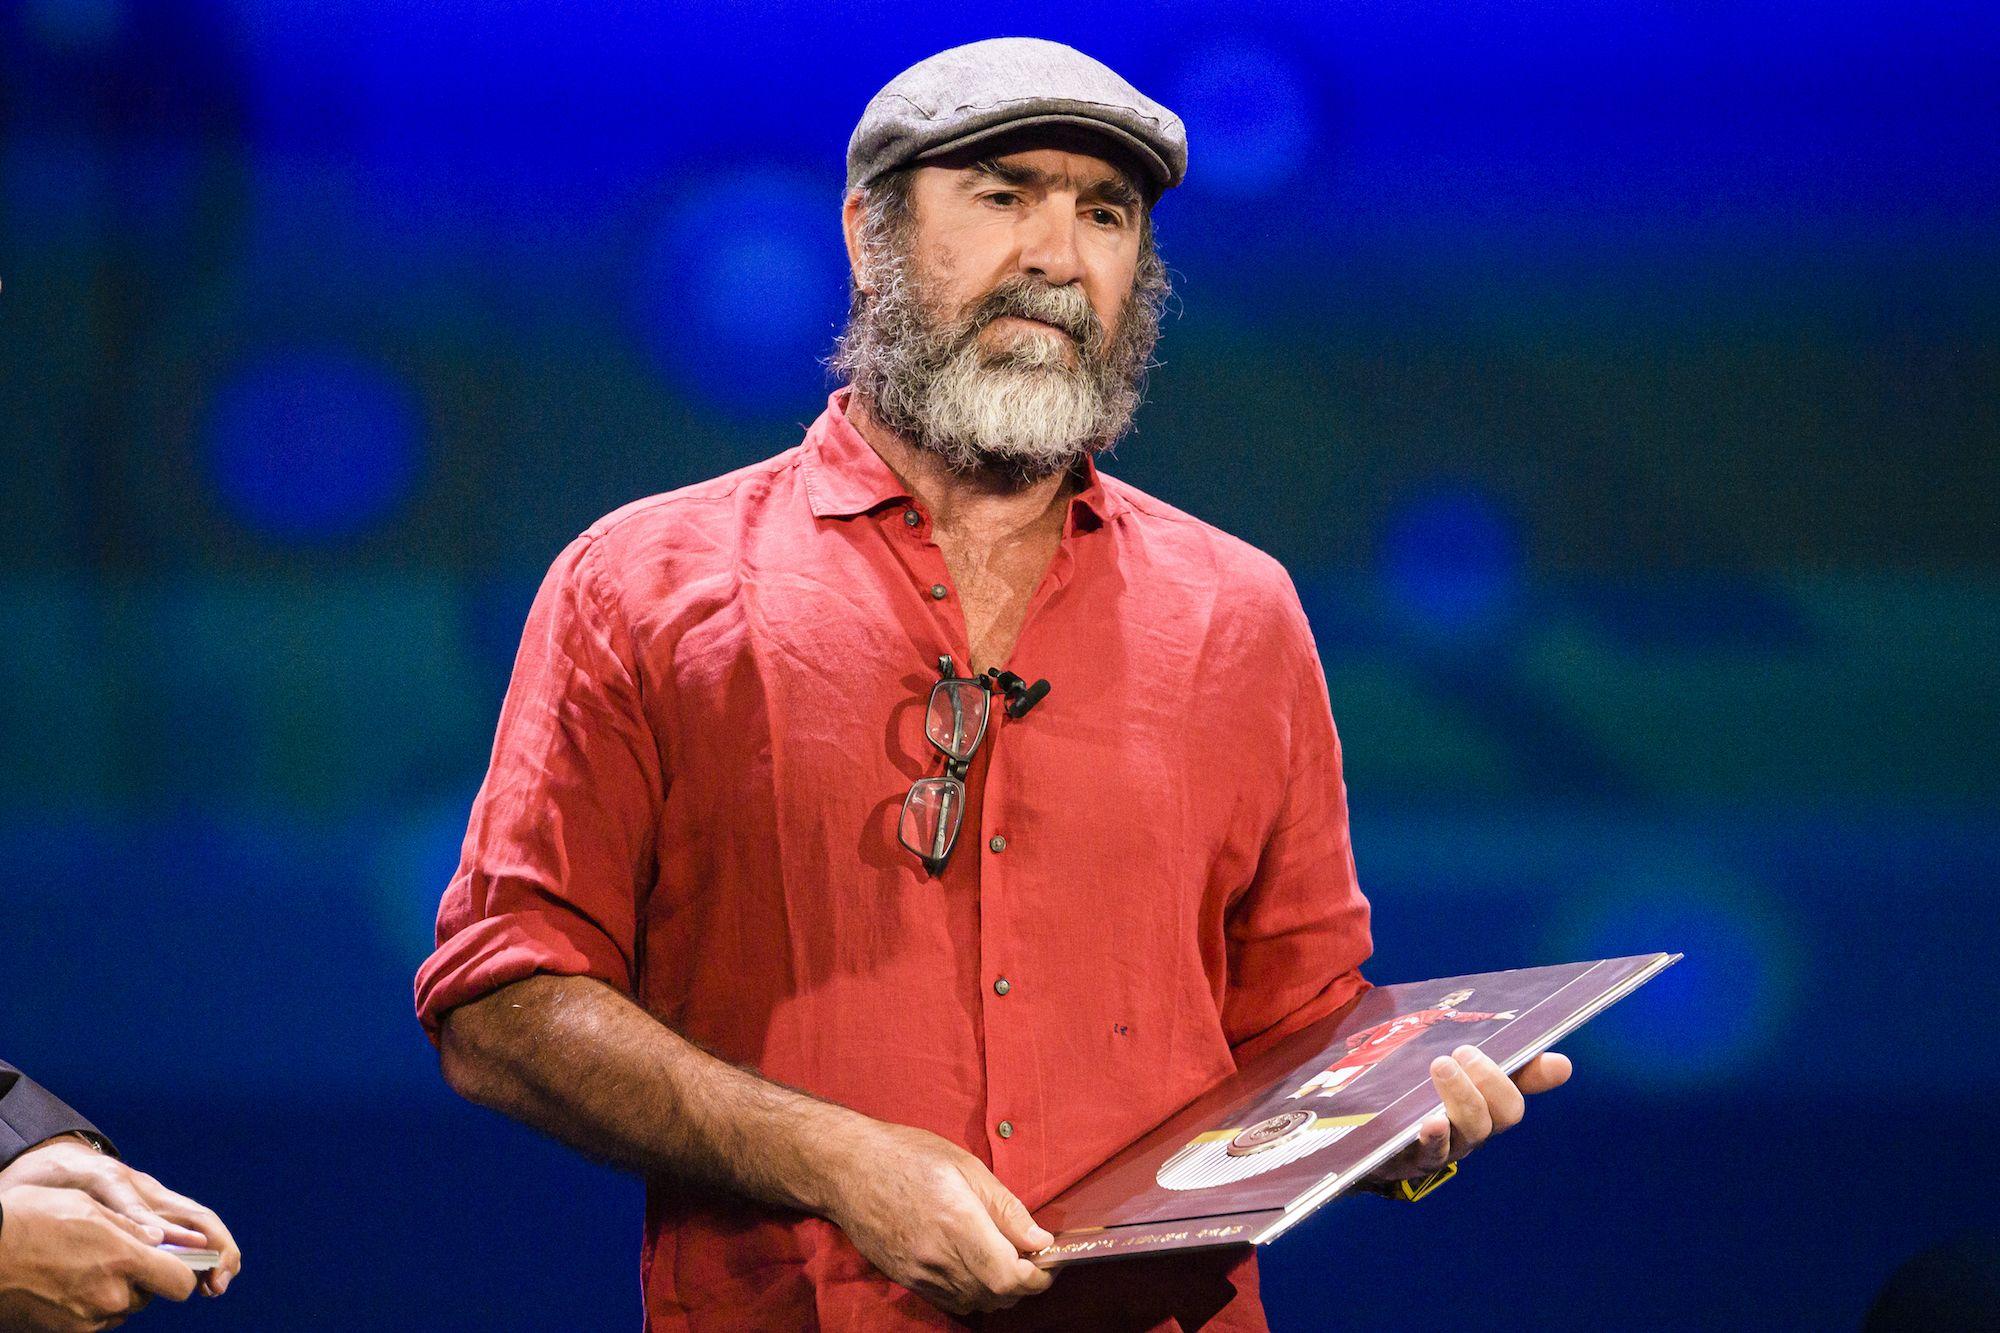 Eric Cantona's Acceptance Speech Was an Existential Meditation